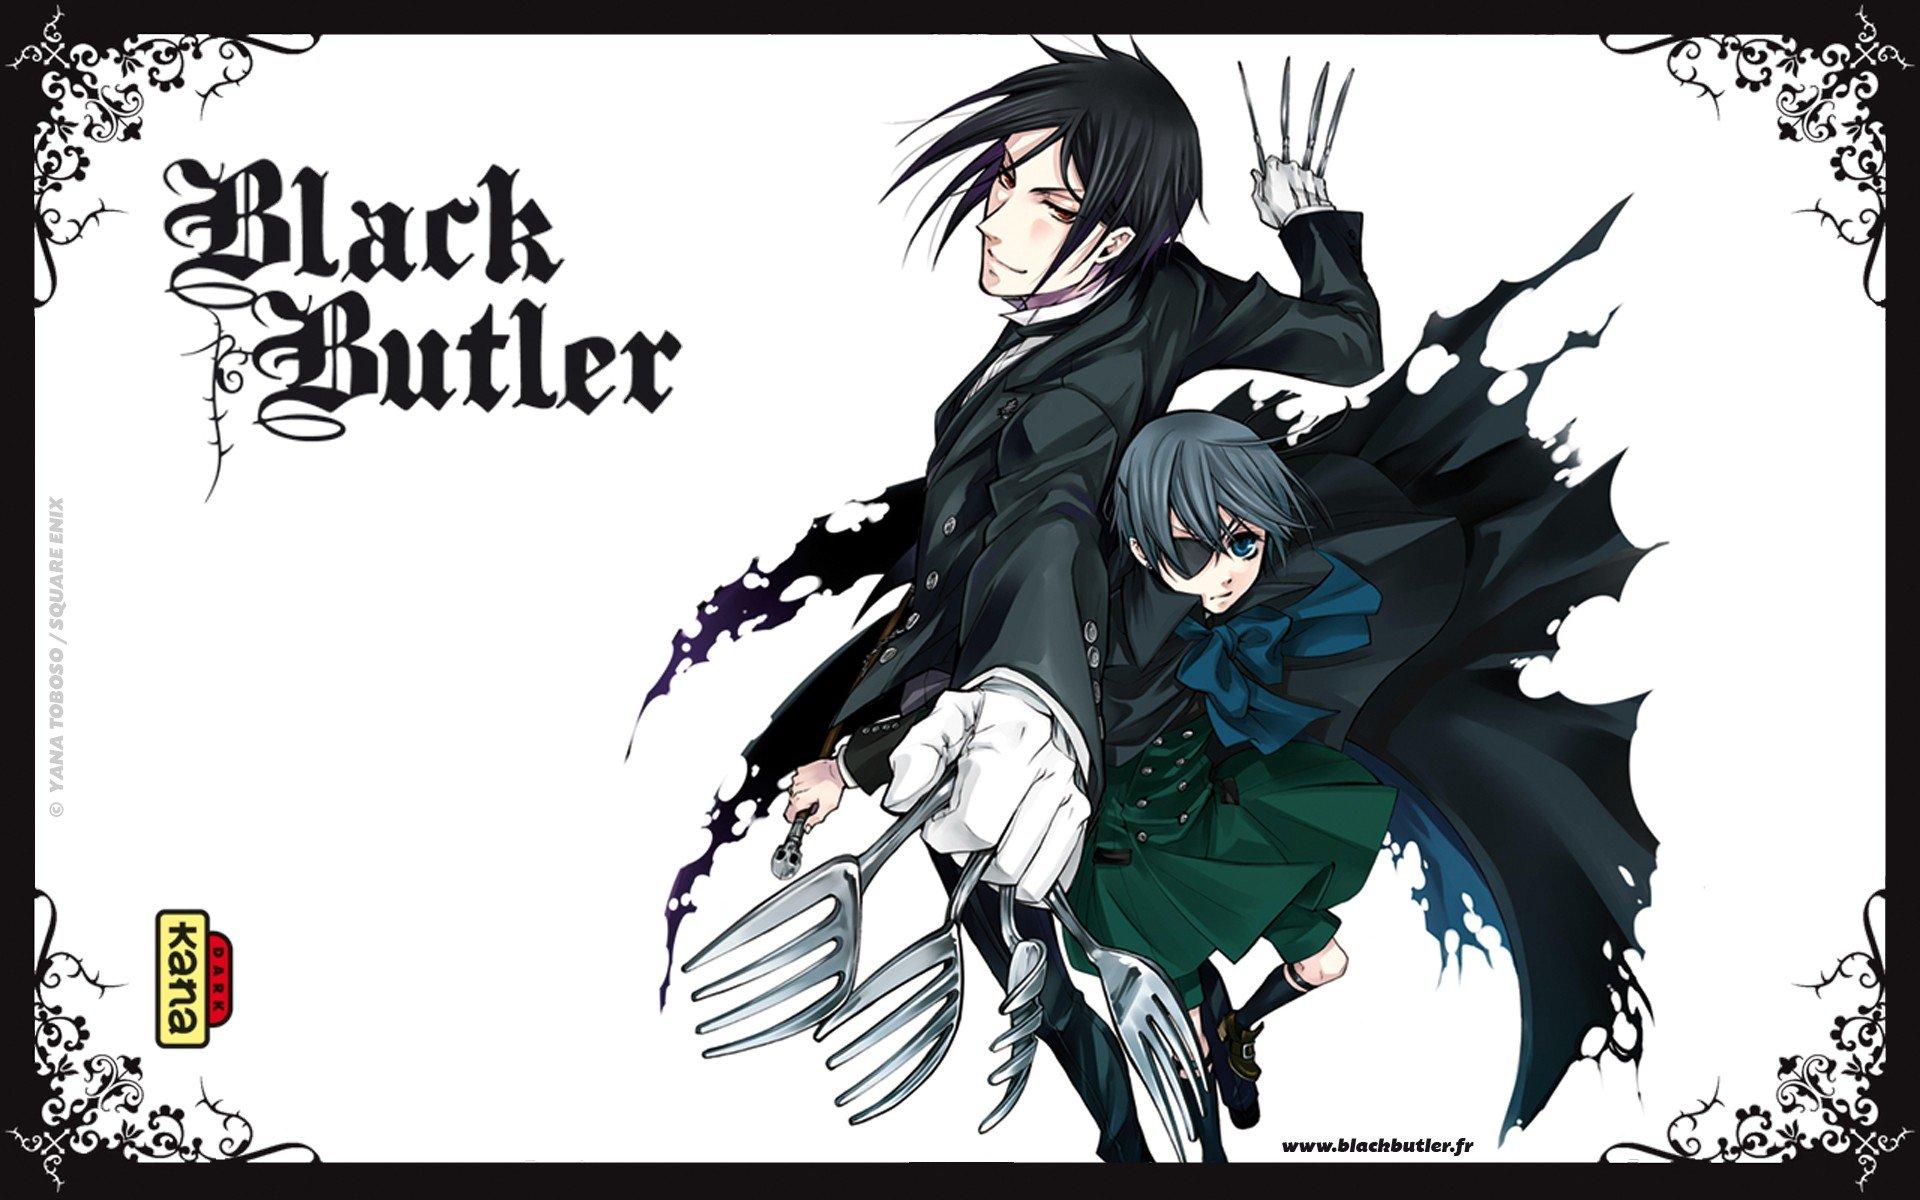 Wallpaper 1920x1200 Px Black Butler Ciel Phantomhive